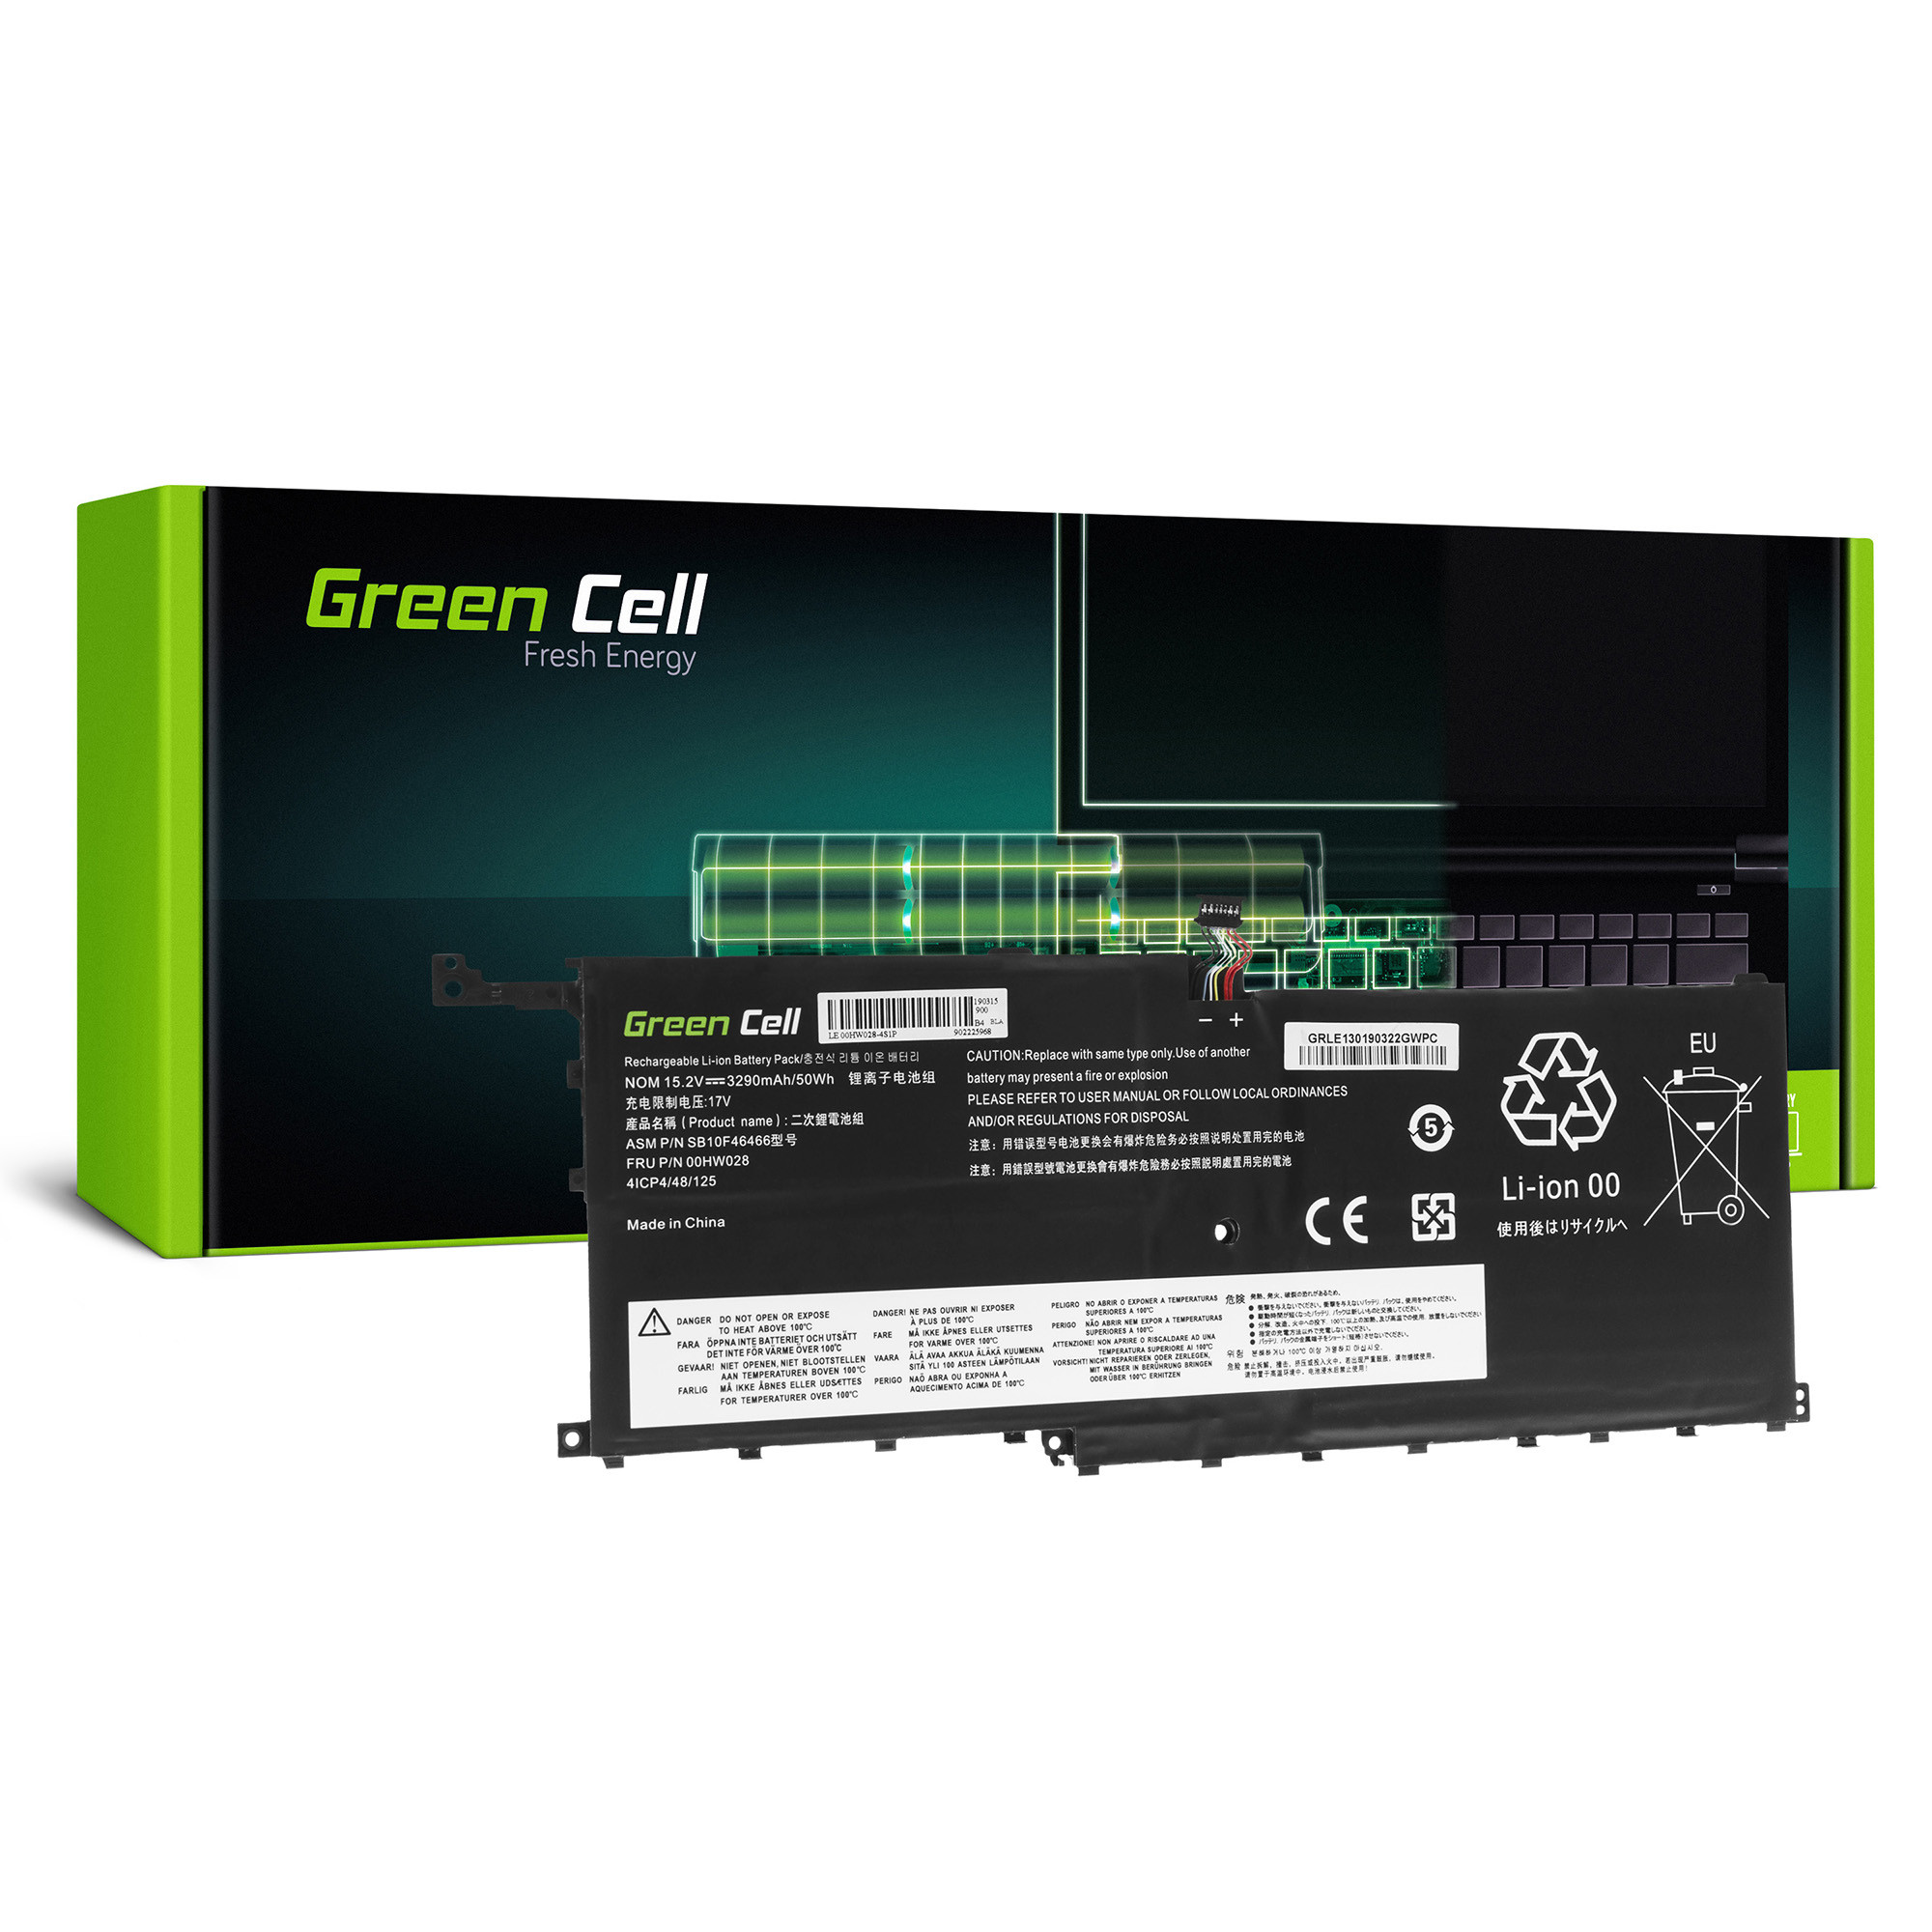 Green Cell Baterie 00HW028 pro Lenovo ThinkPad X1 Carbon 4th Gen i Lenovo ThinkPad X1 Yoga (1st Gen, 2nd Gen)